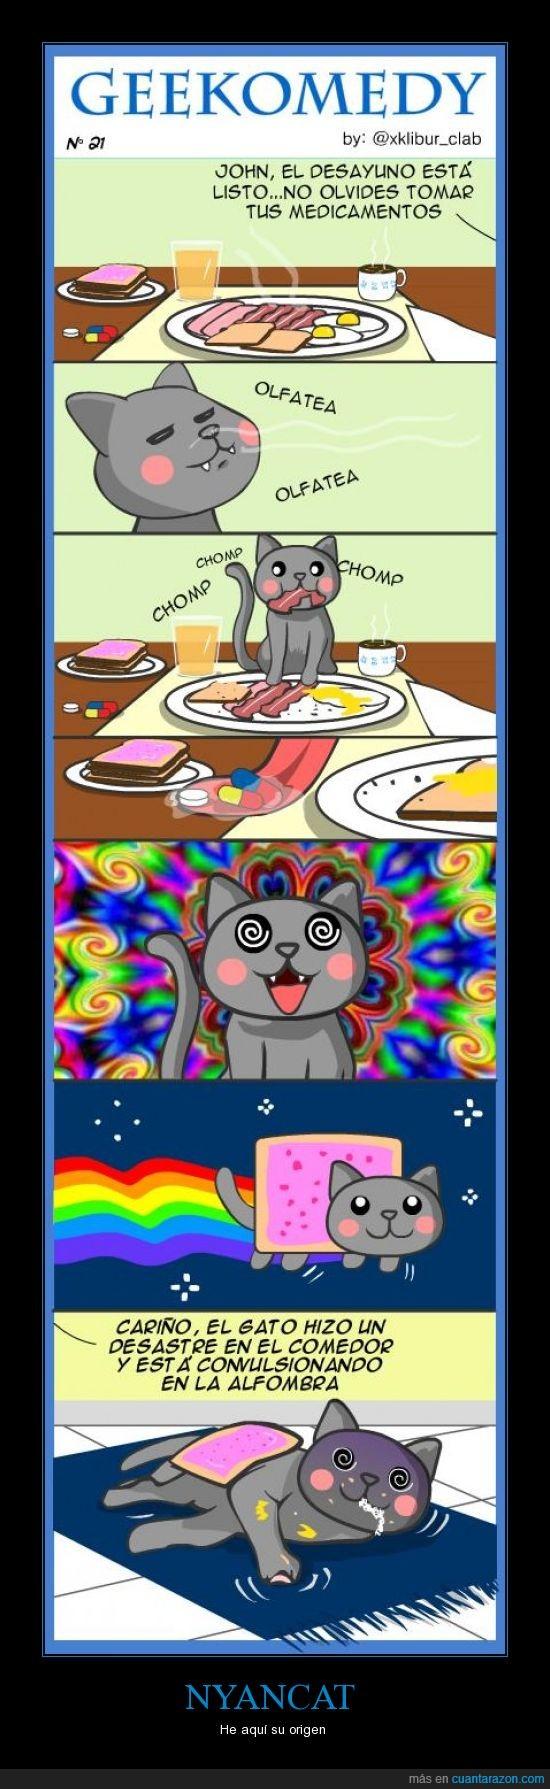 colores,gato,nyan cat,pastillas